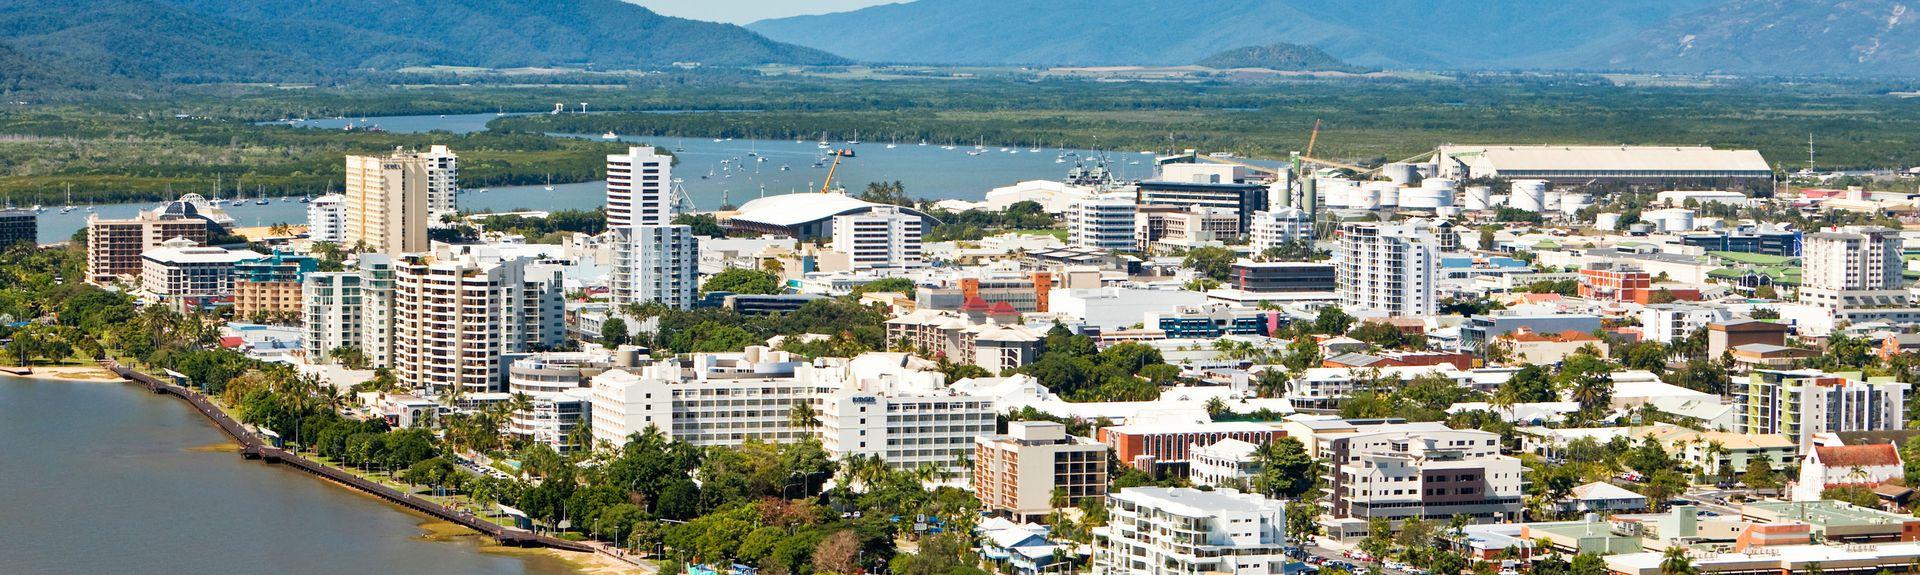 Cairns, QLD, Australia